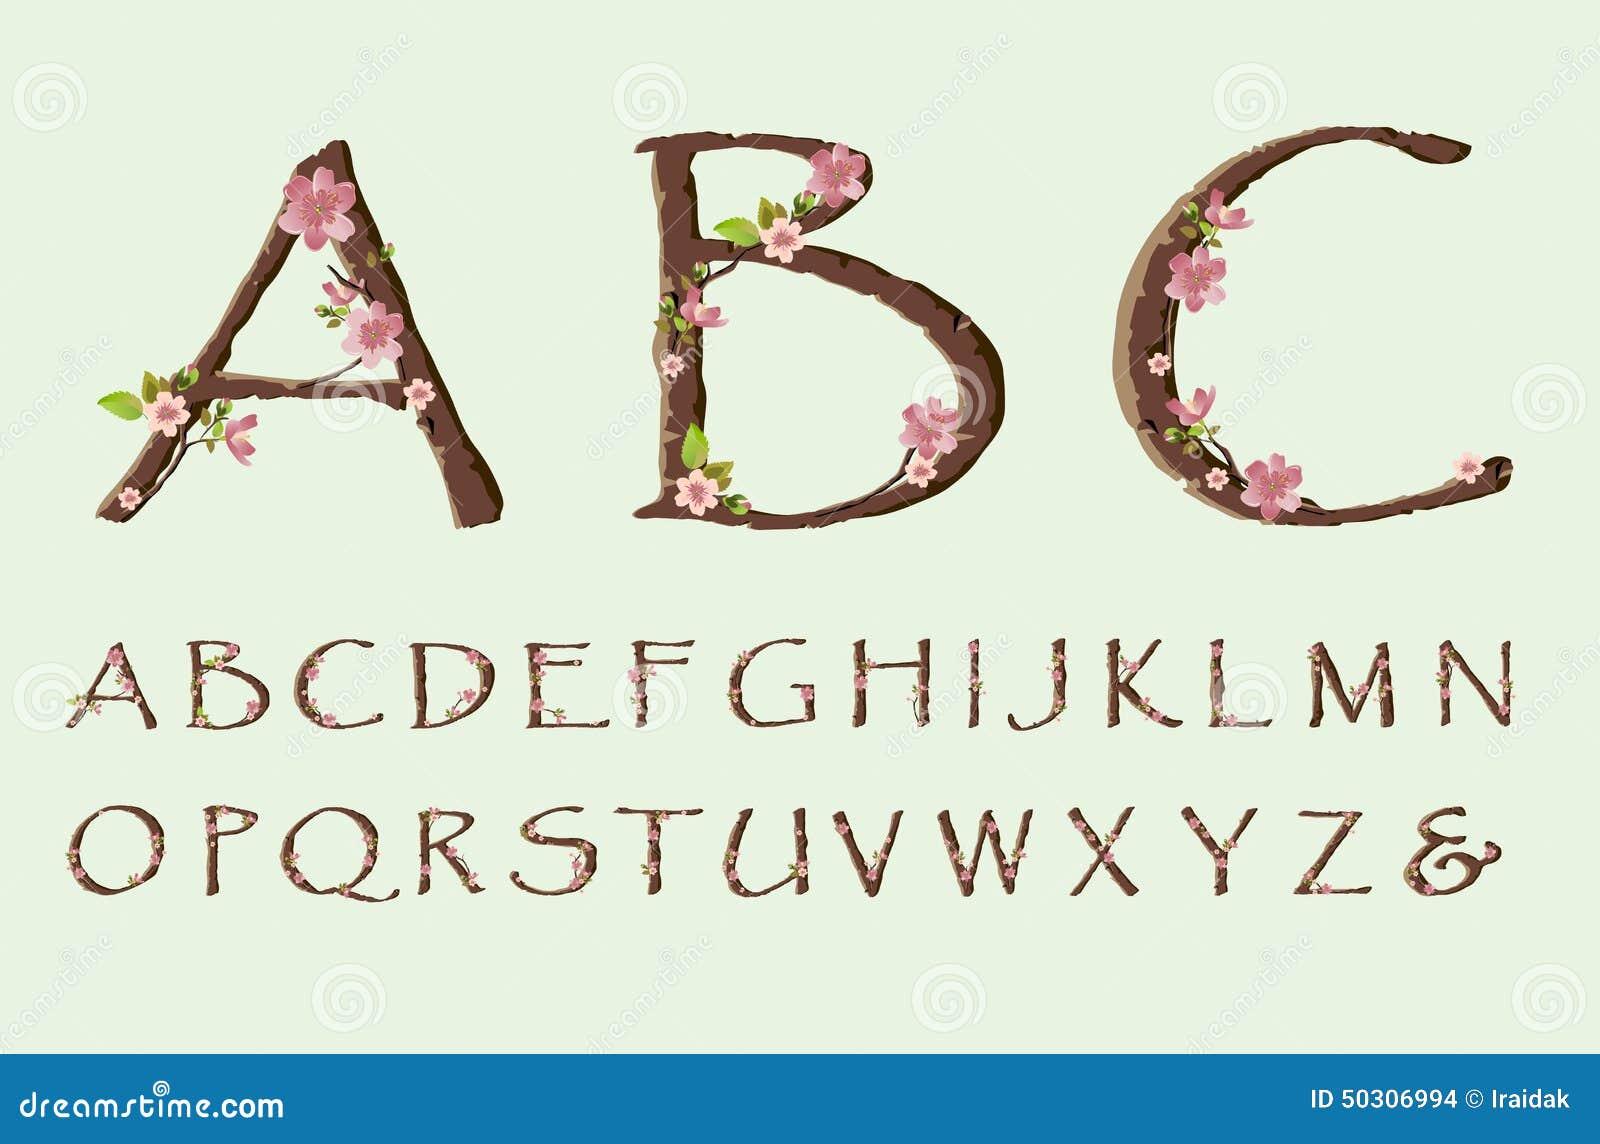 Cherry Blossom Font Stock Vector - Image: 50306994